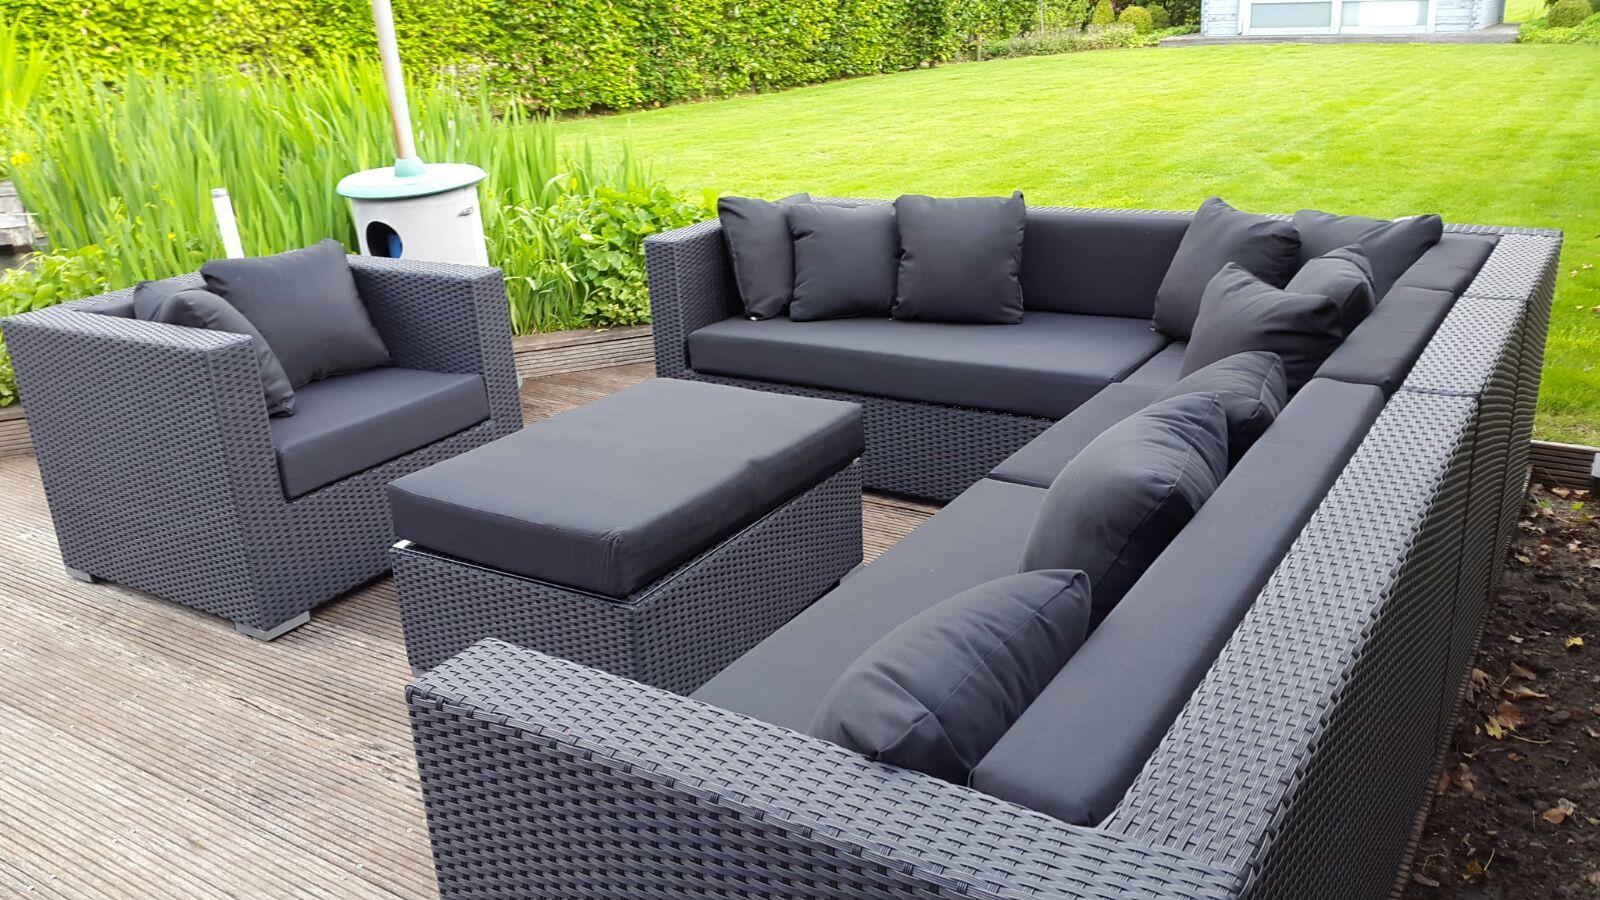 Goedkope Lounge Kussens : Kussens loungeset loungeset kussen kopen online internetwinkel